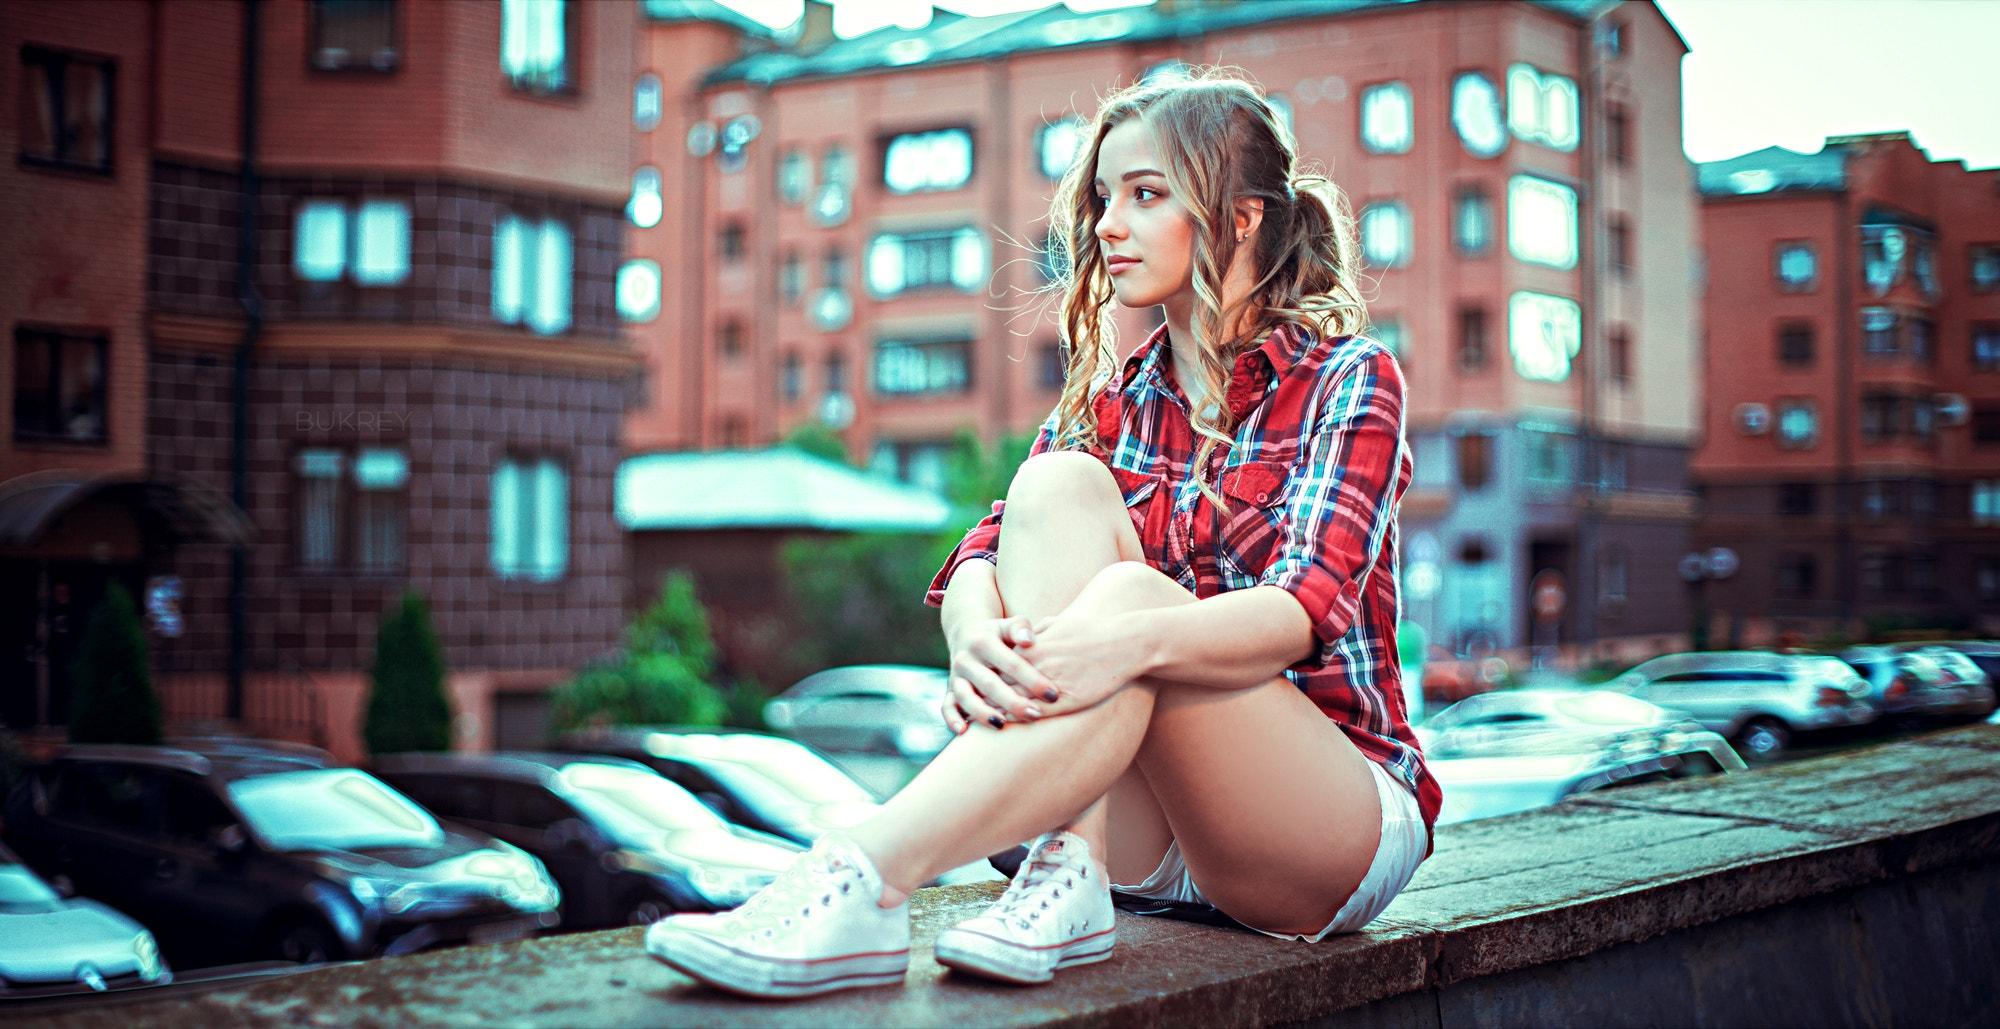 People 2000x1029 women brunette women outdoors bokeh shirt short shorts sitting urban legs looking away sneakers Kirill Bukrey plaid shirt Varya